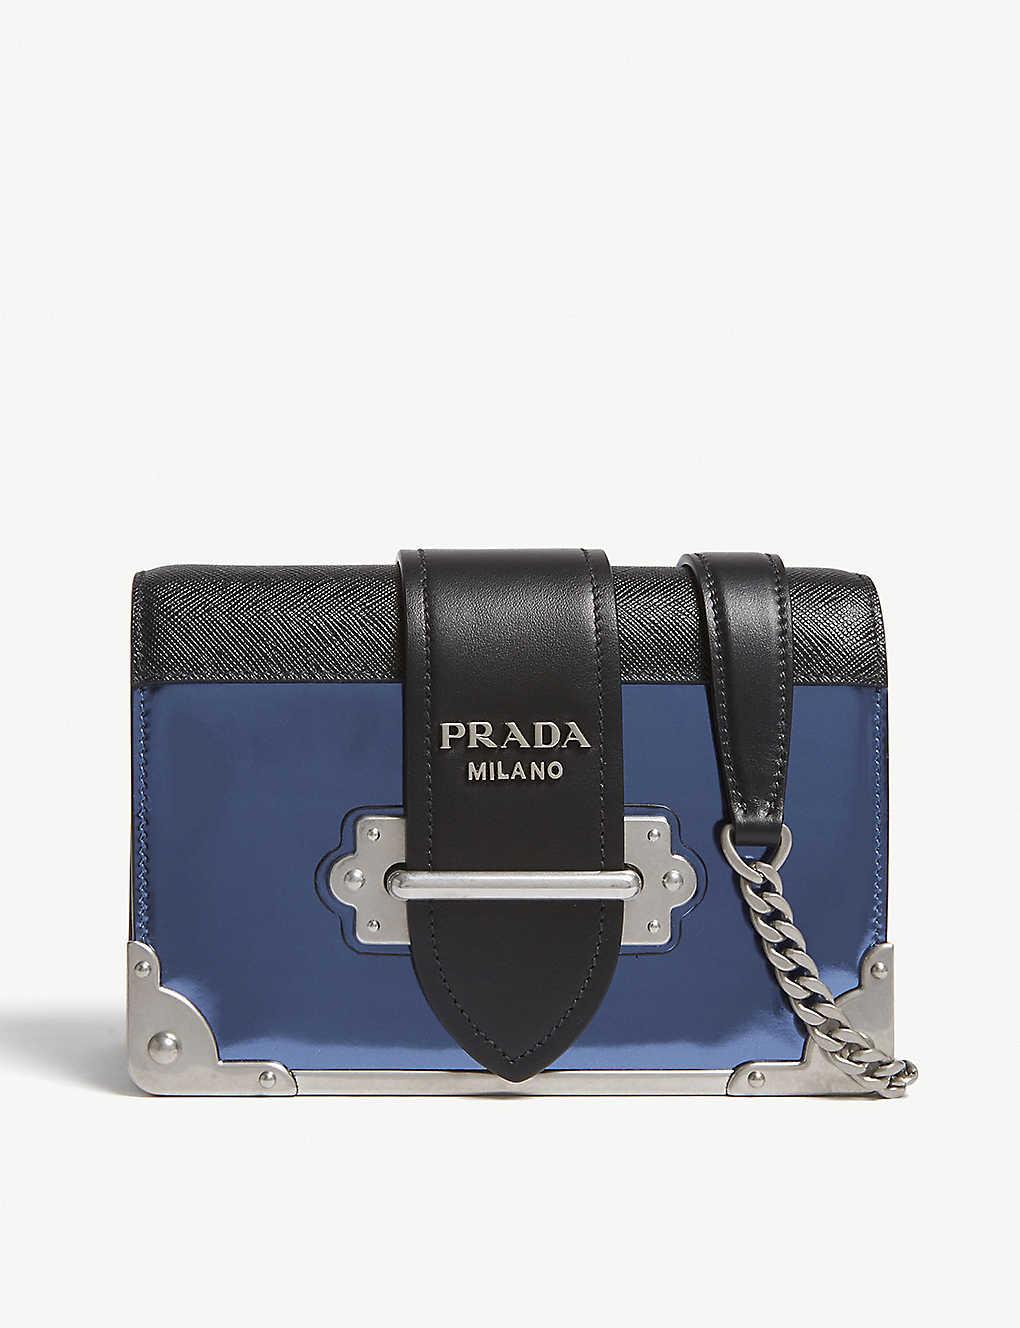 162ffbd1f7f2 PRADA - Cahier small metallic leather shoulder bag | Selfridges.com